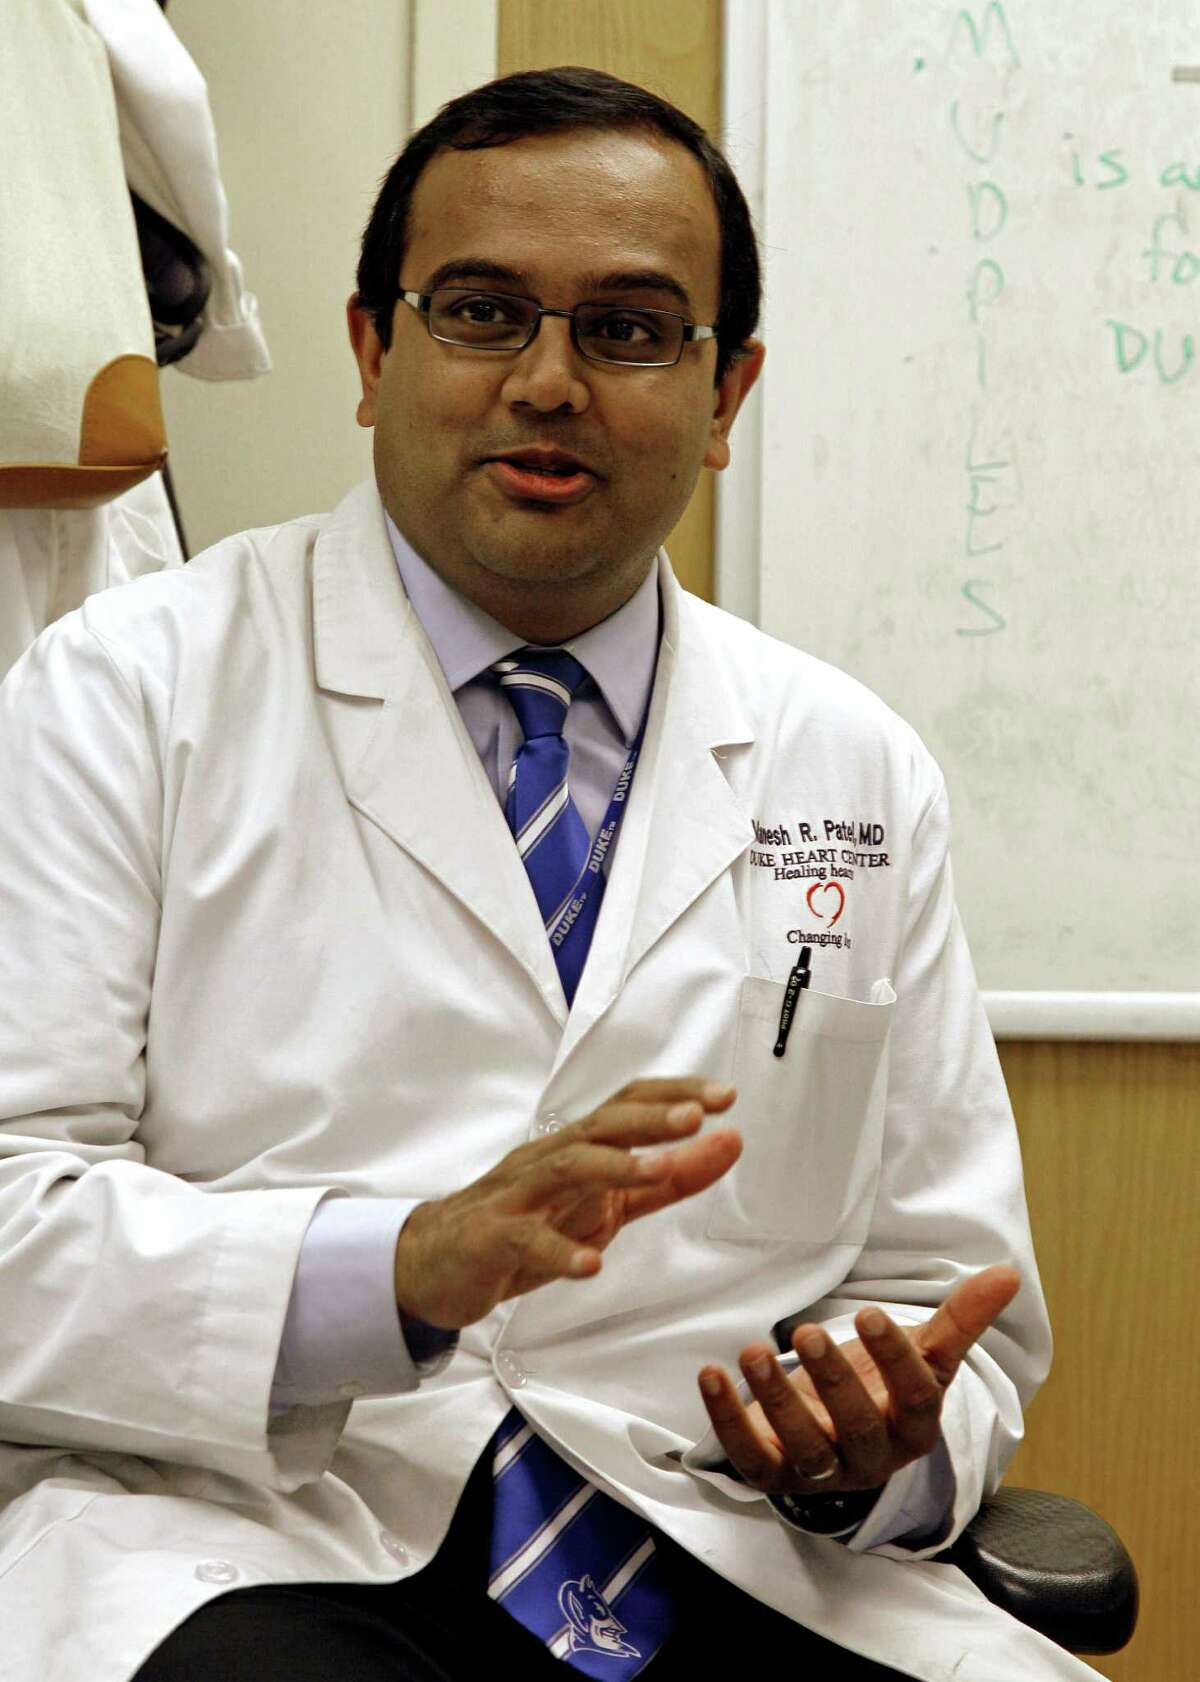 Dr. Manesh Patel of Duke University is involved in the new study.